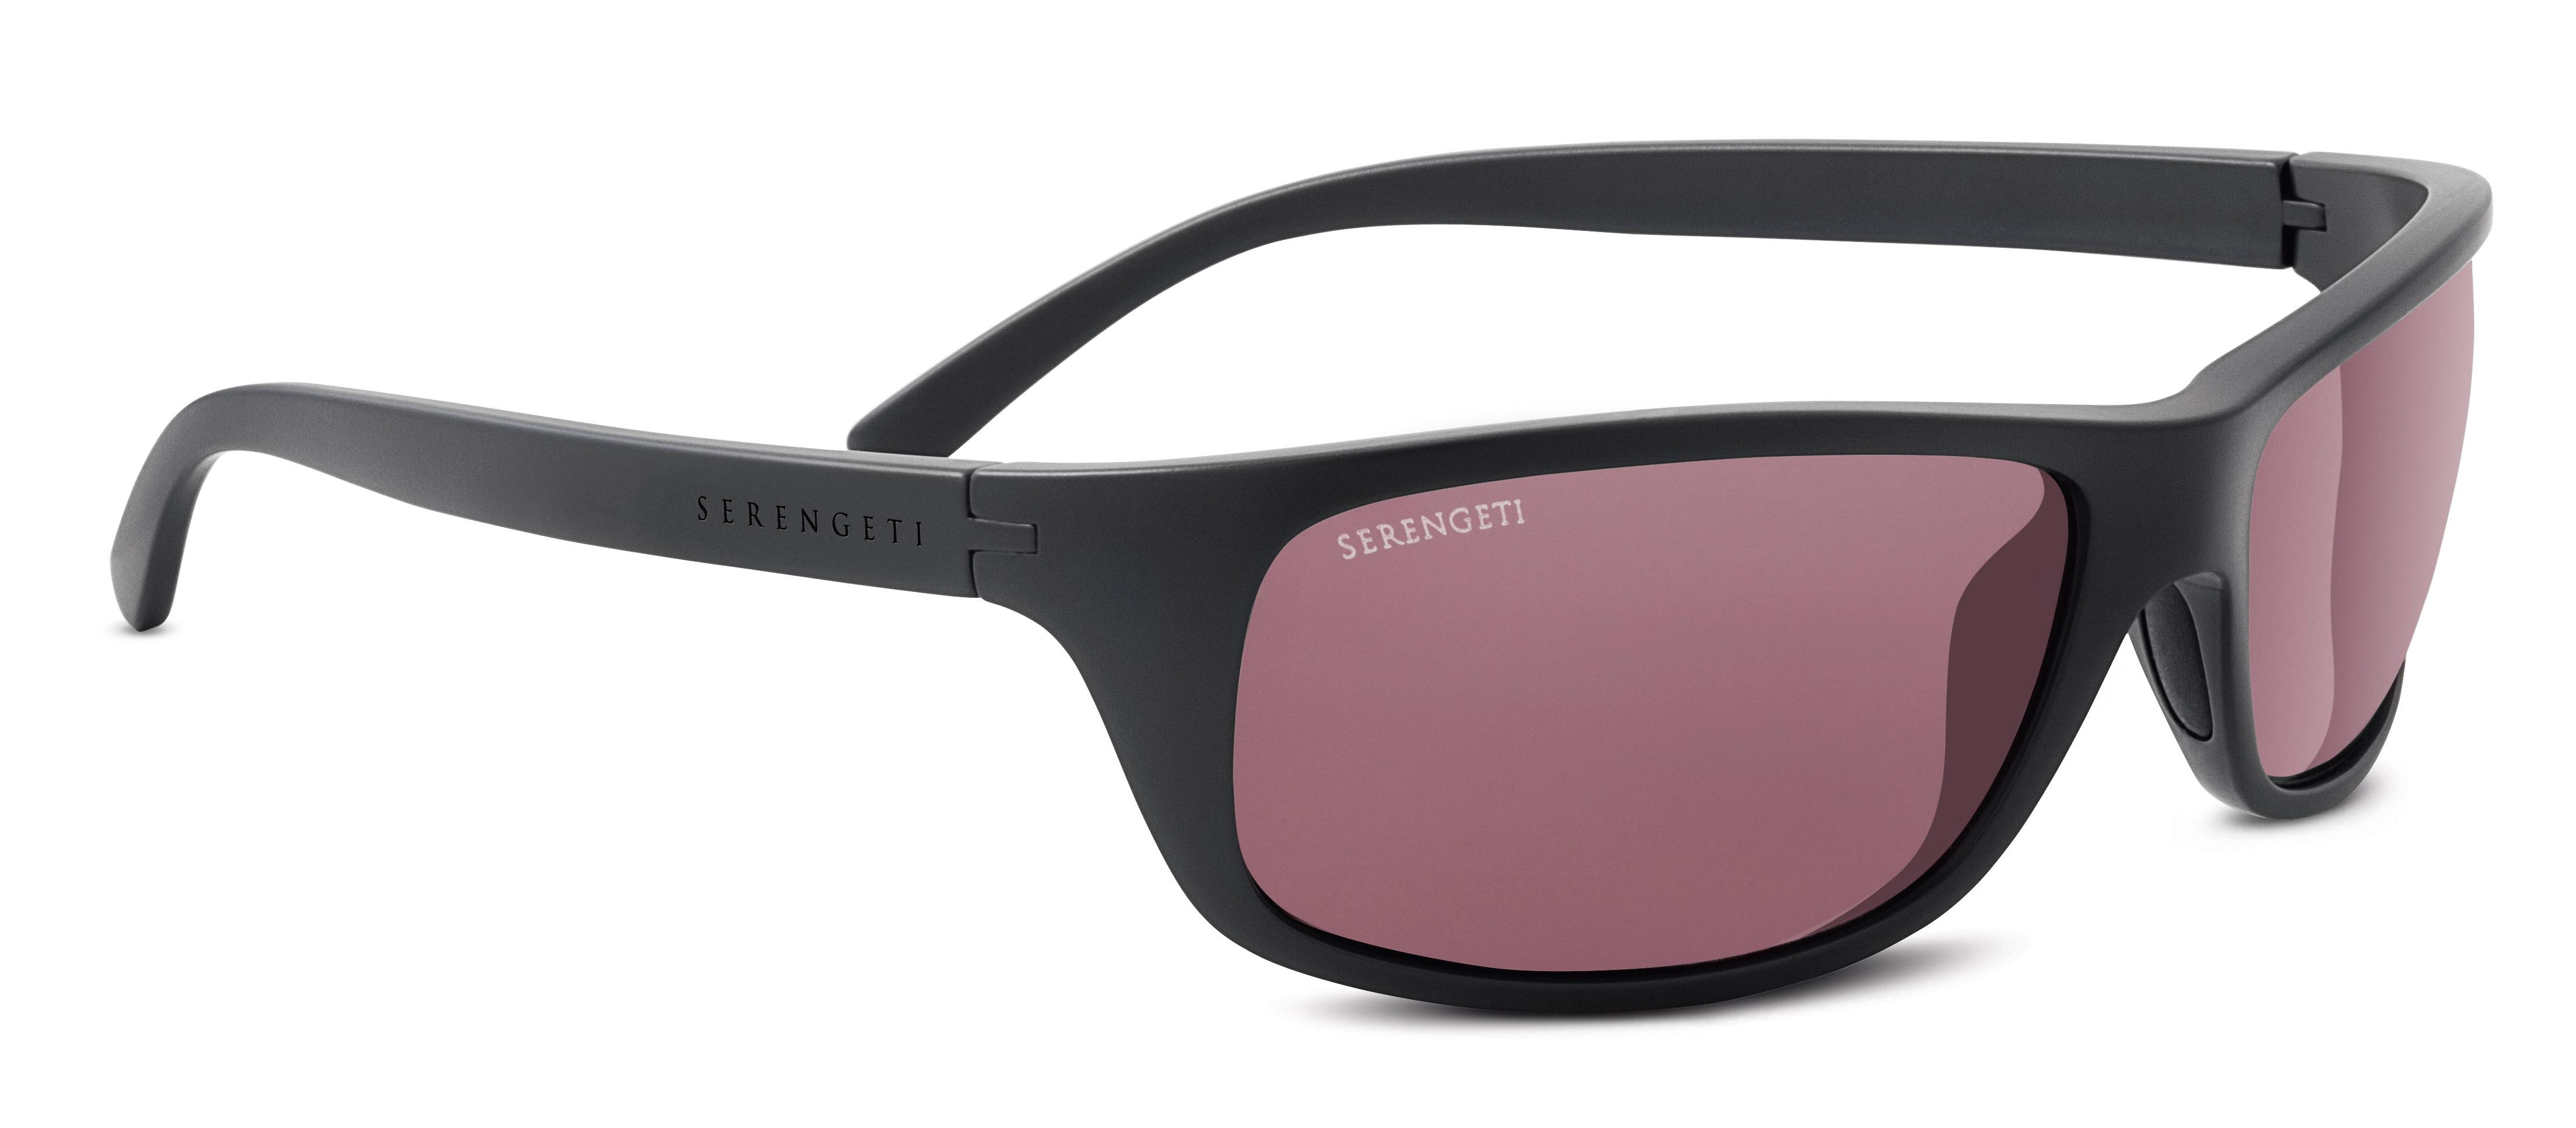 4eb84d70f6f Serengeti Bormio Sunglasses